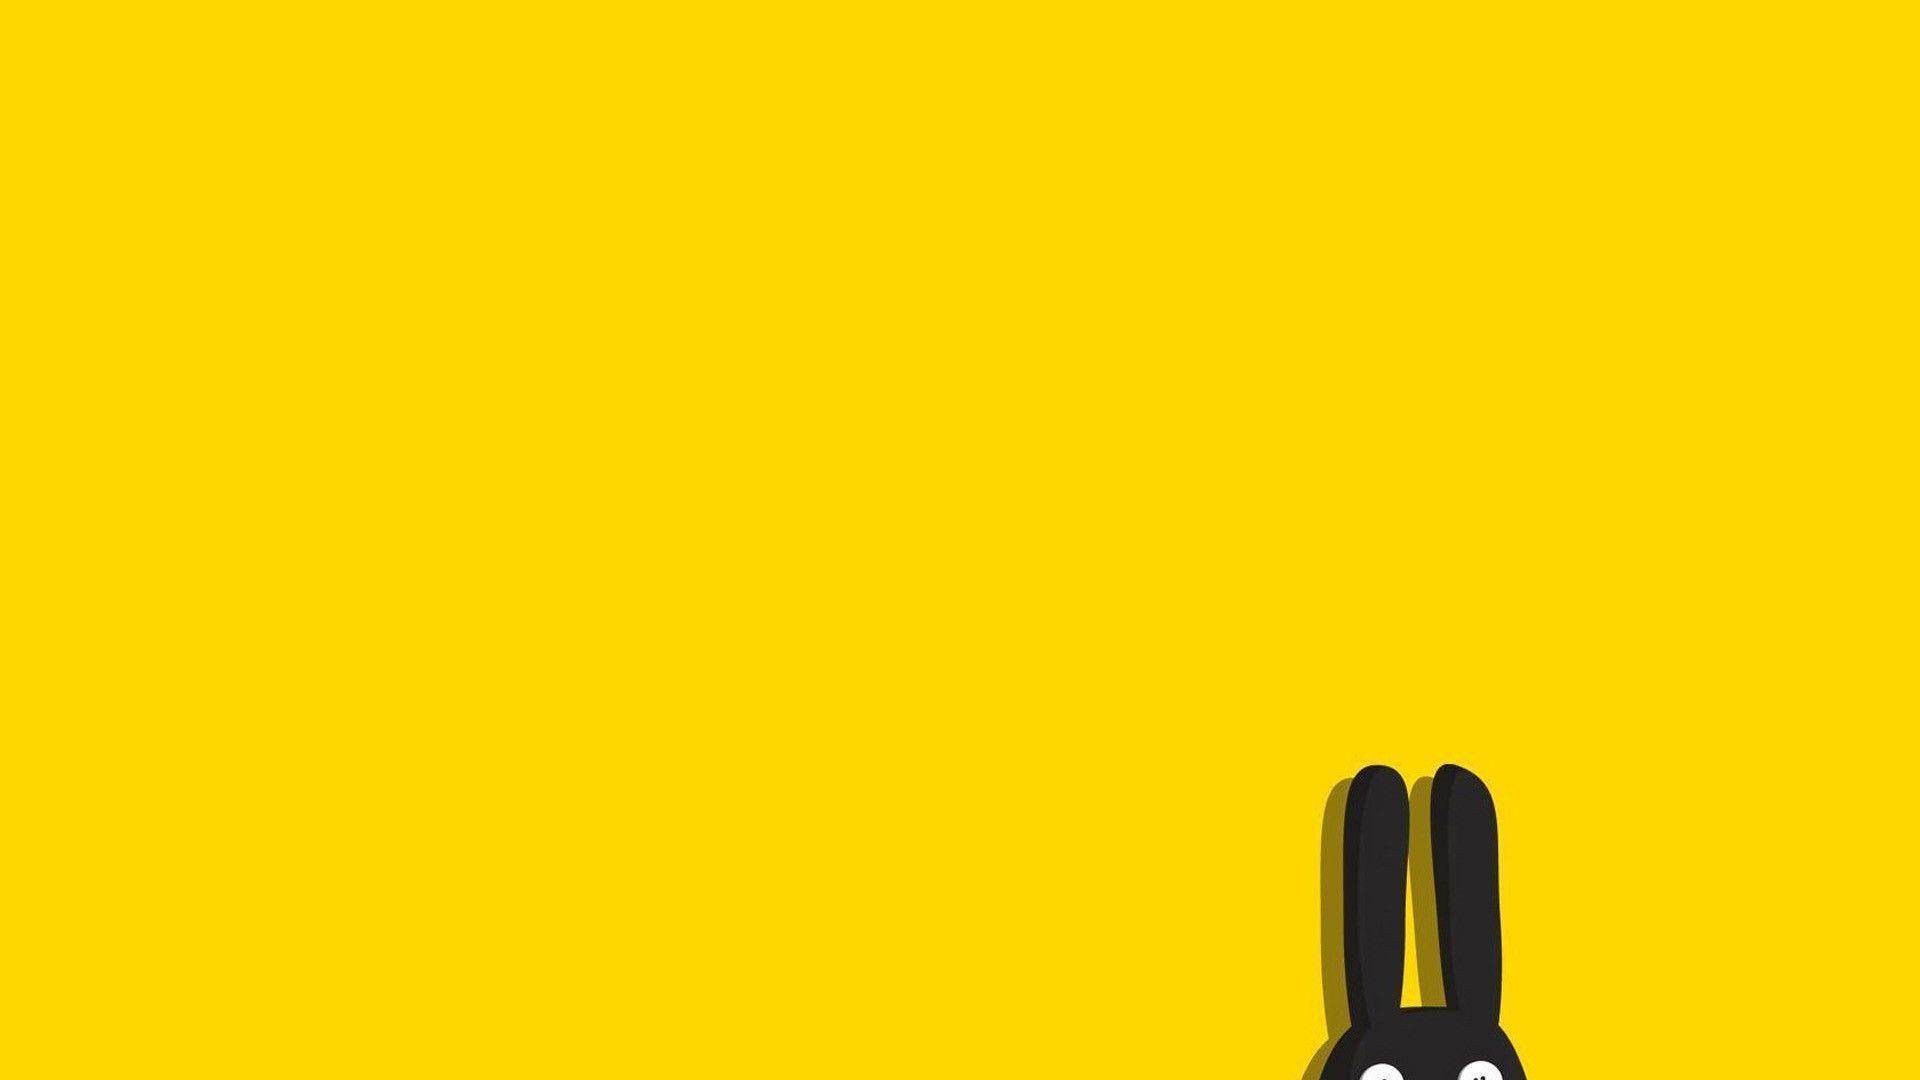 yellow aesthetic wallpaper 20072002223649